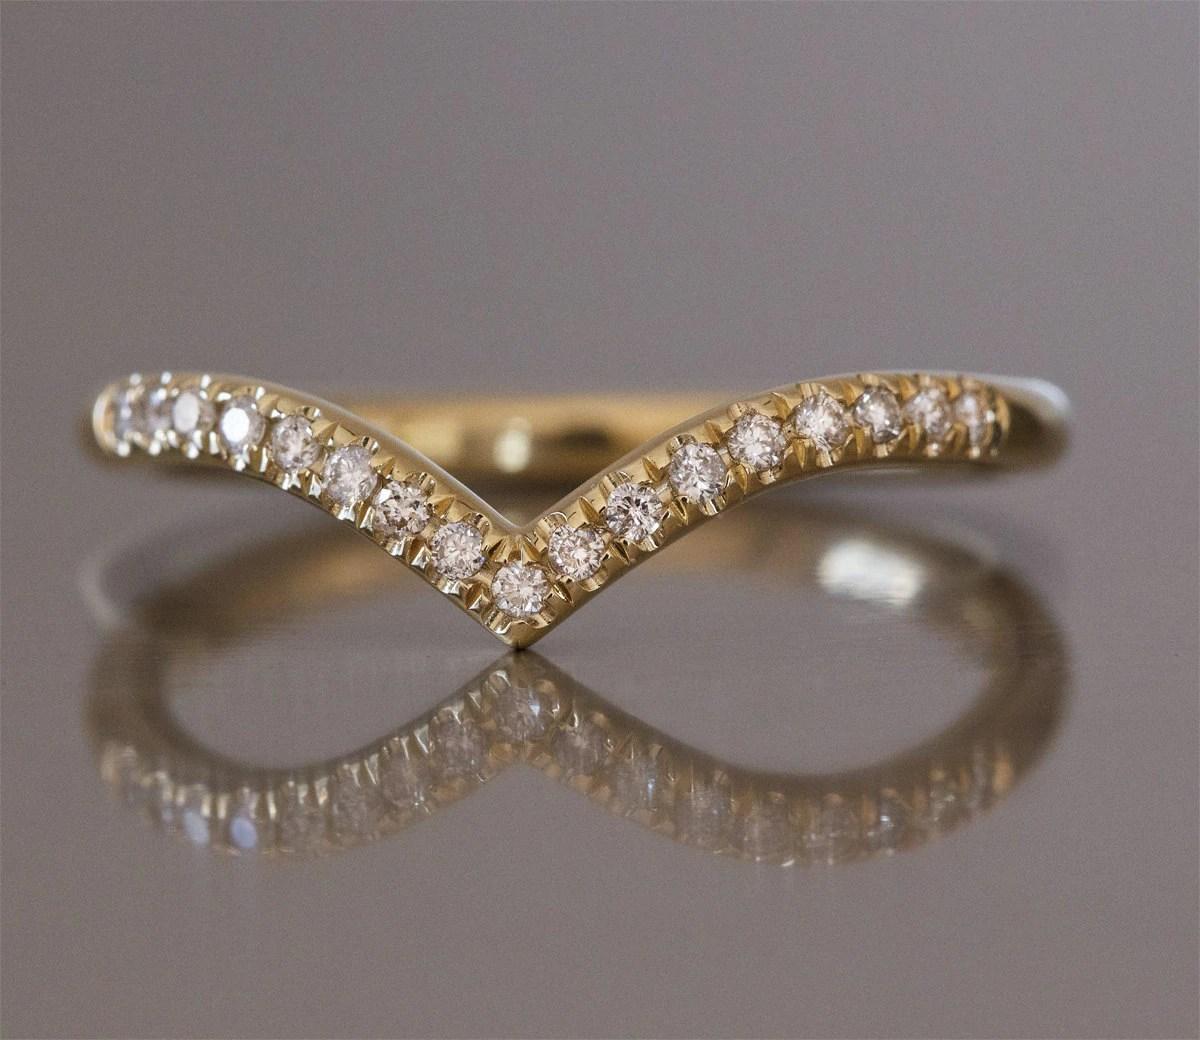 curved wedding band contour diamond wedding band curved wedding band diamond v ring curved wedding ring chevron diamond ring elegant wedding ring thin diamond ring curved ring